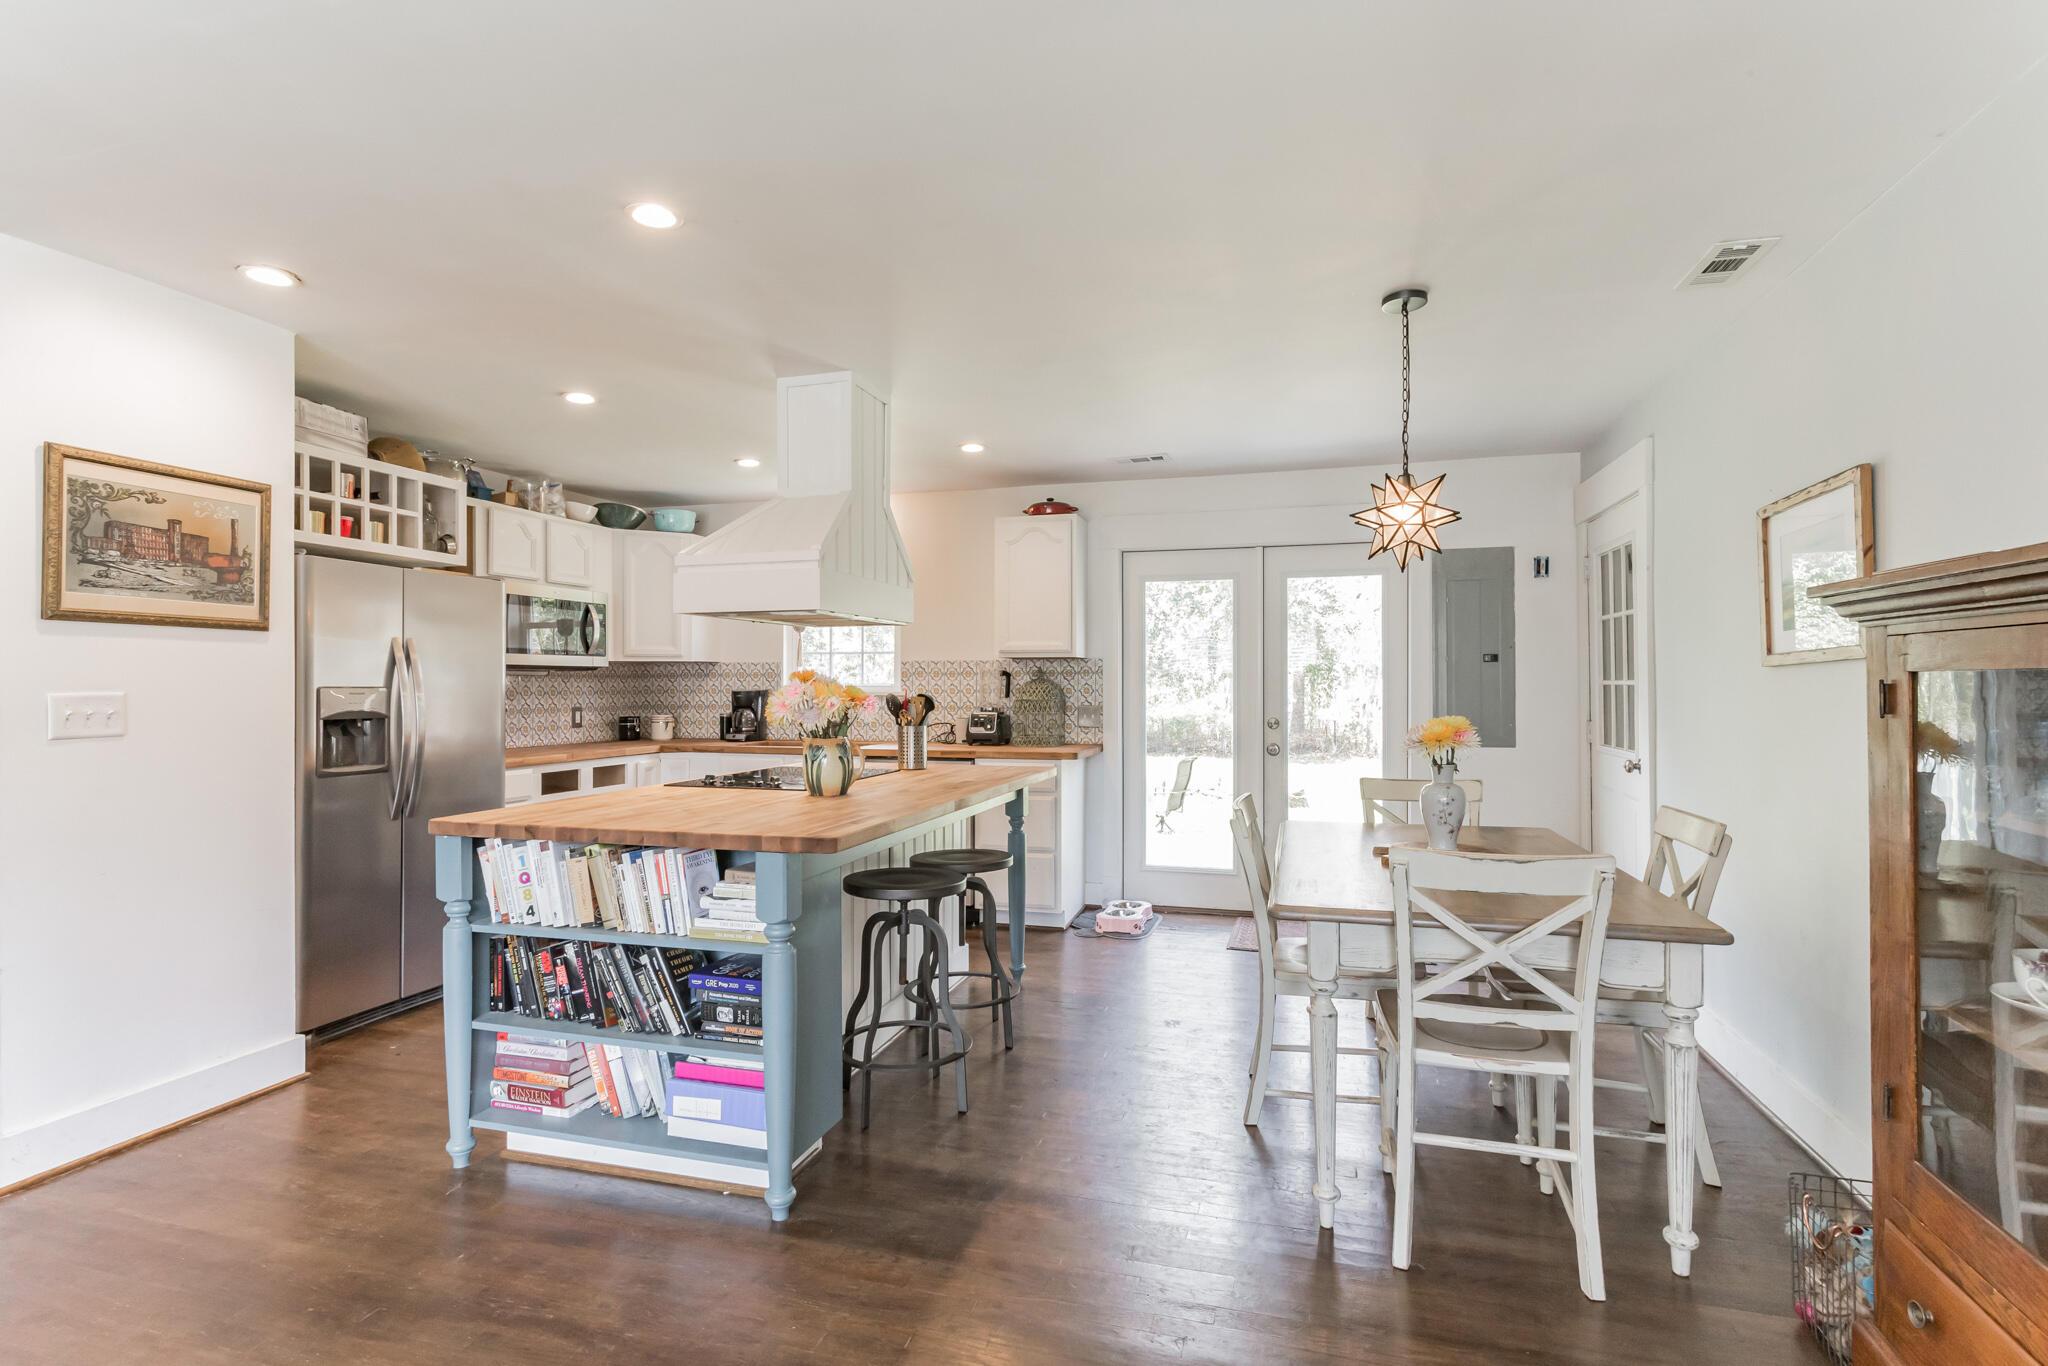 Stafford Heights Homes For Sale - 3472 Cynthia, Johns Island, SC - 1